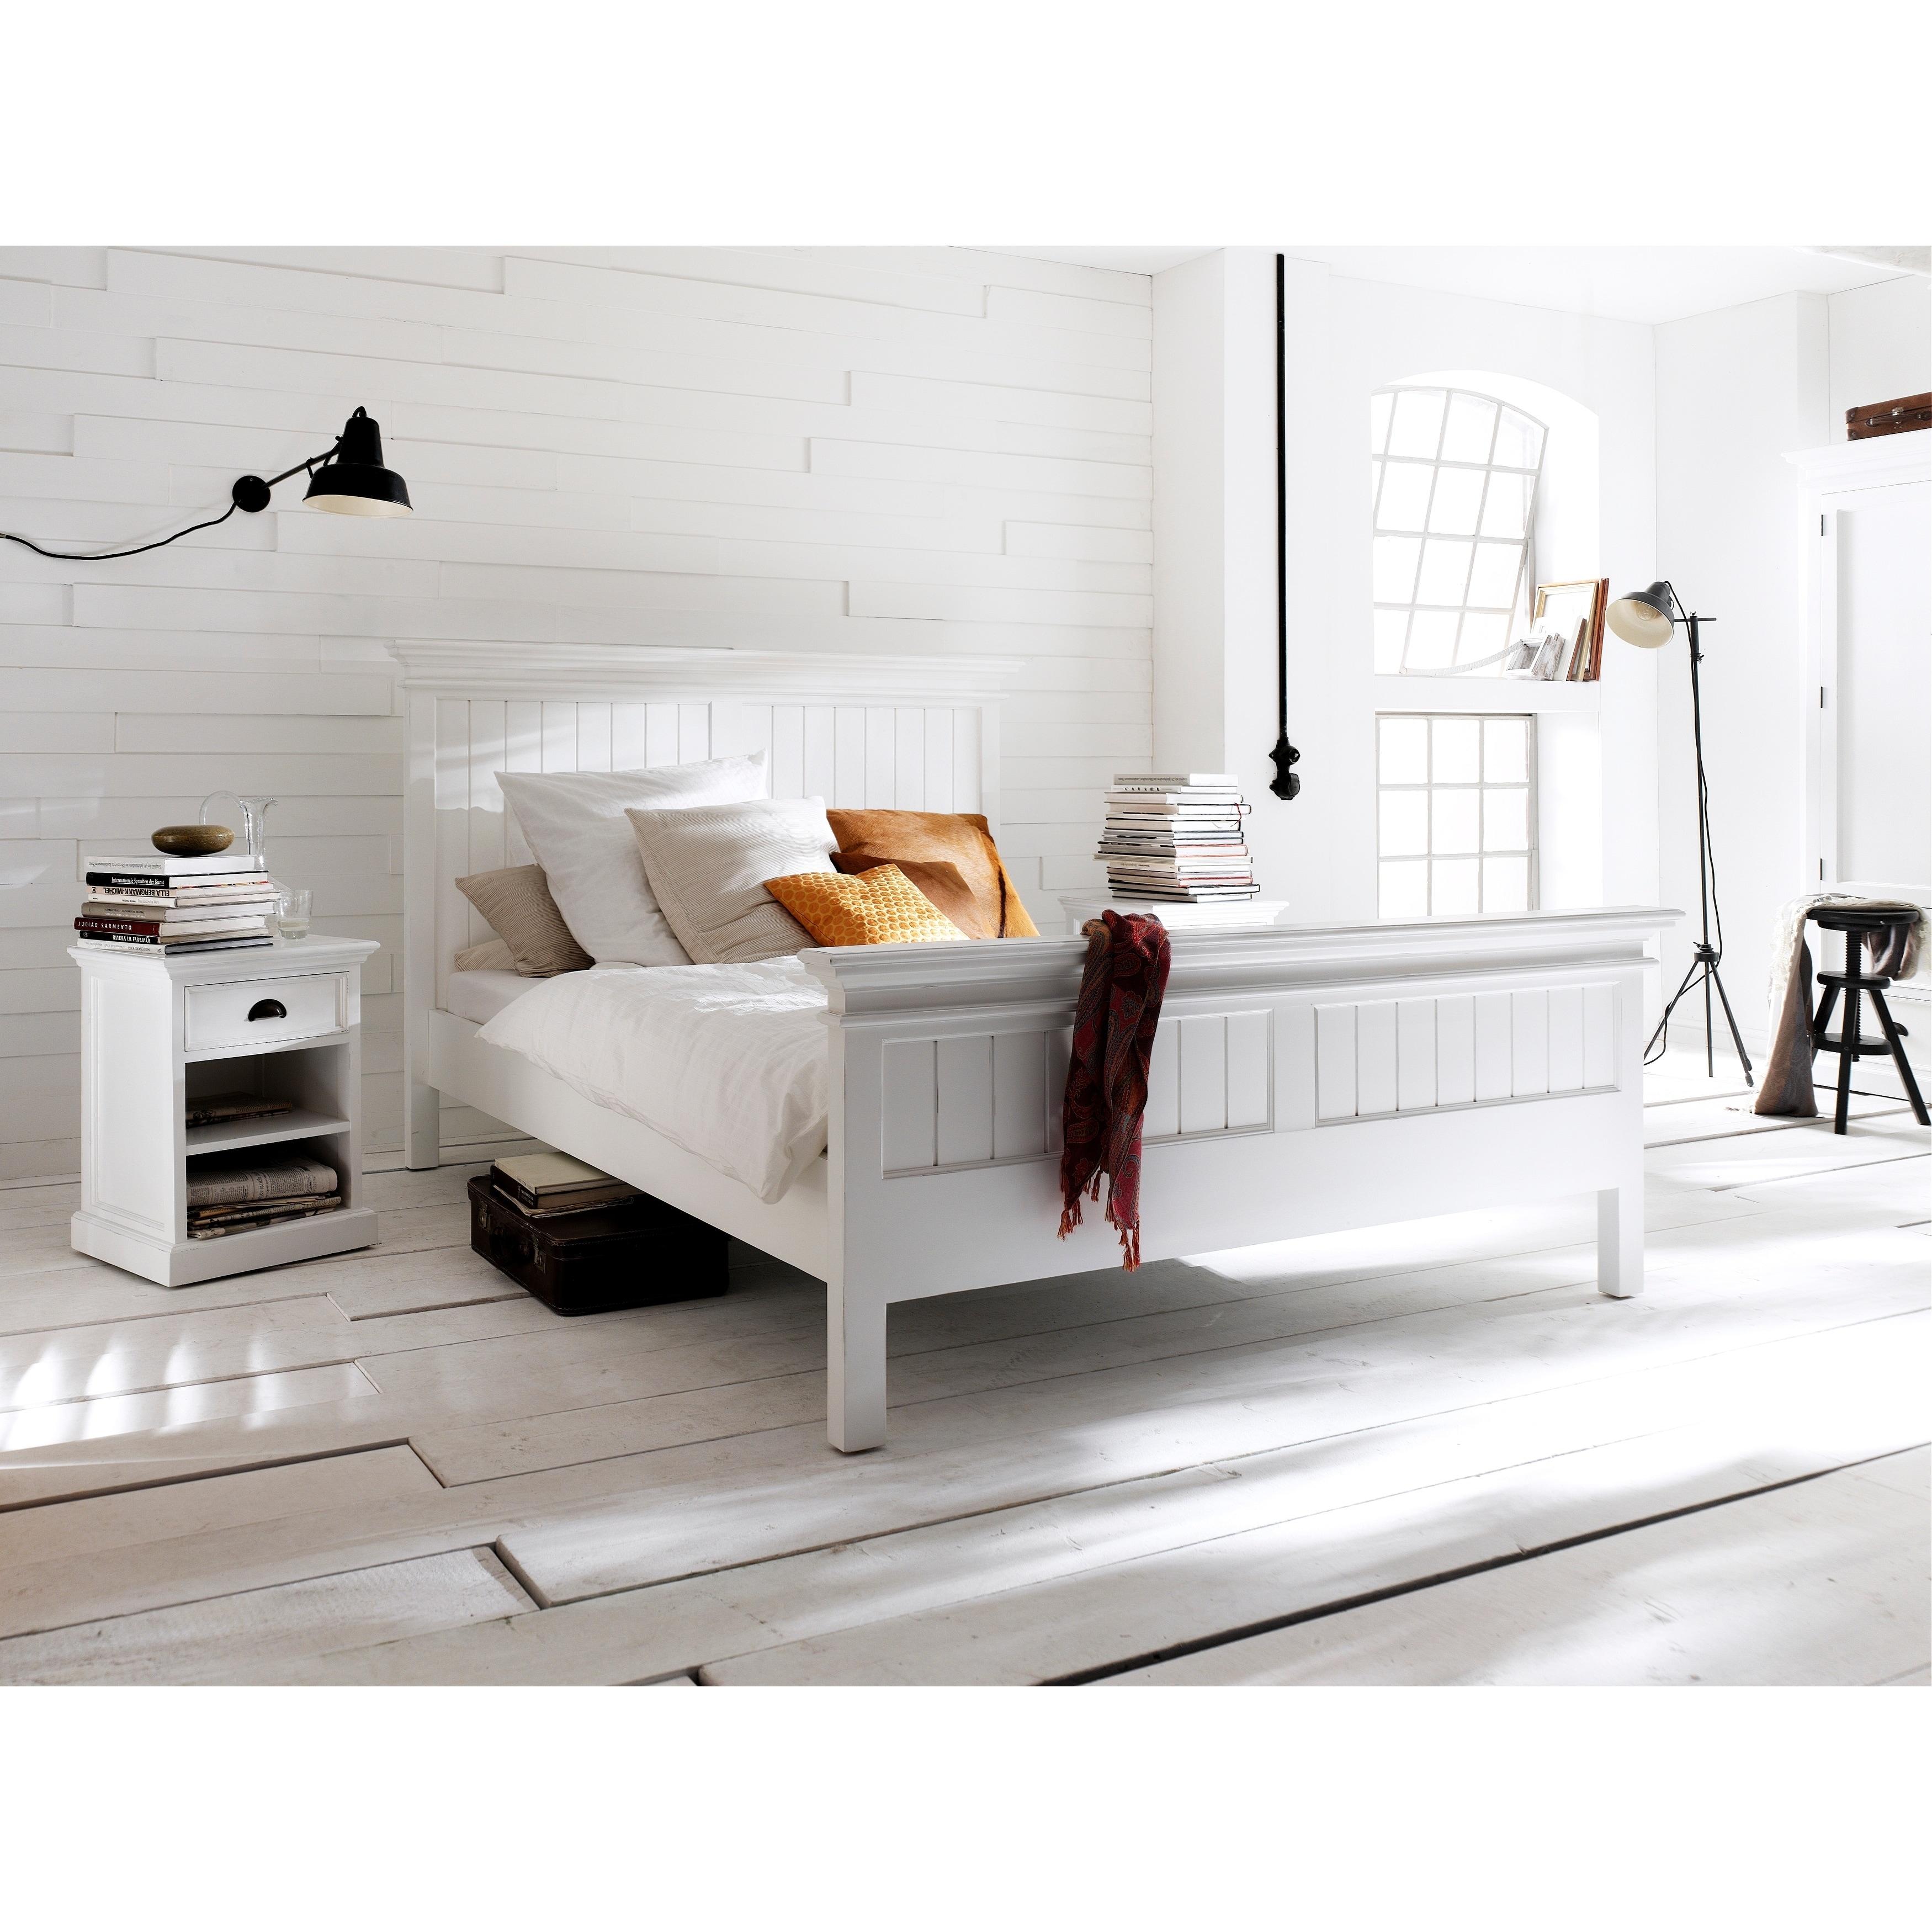 Shop Novasolo Mahogany King Size Bed Free Shipping On